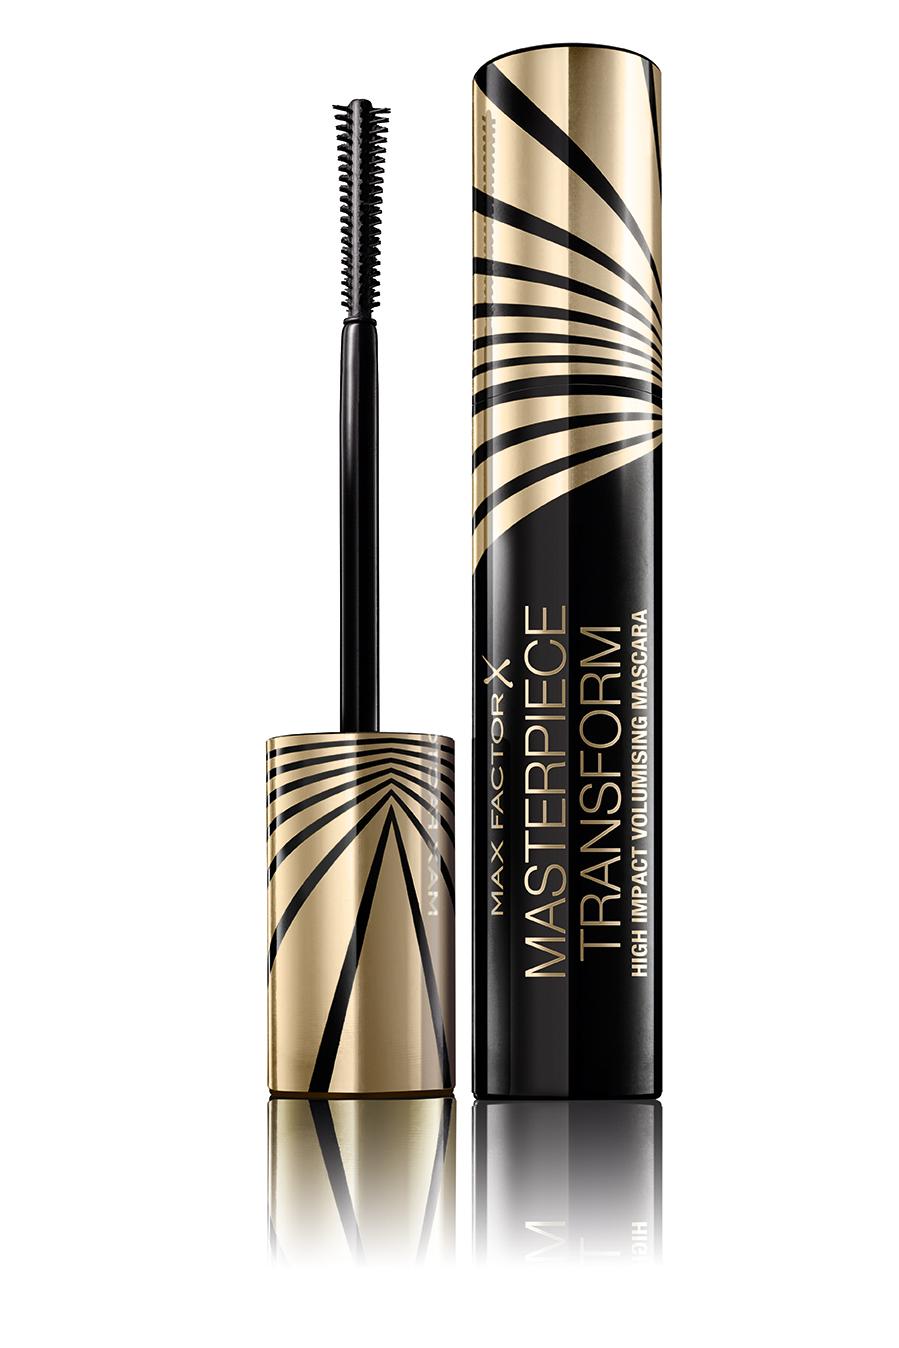 Max Factor_Masterpiece Transform High Impact Volumising Mascara  pack.jpg